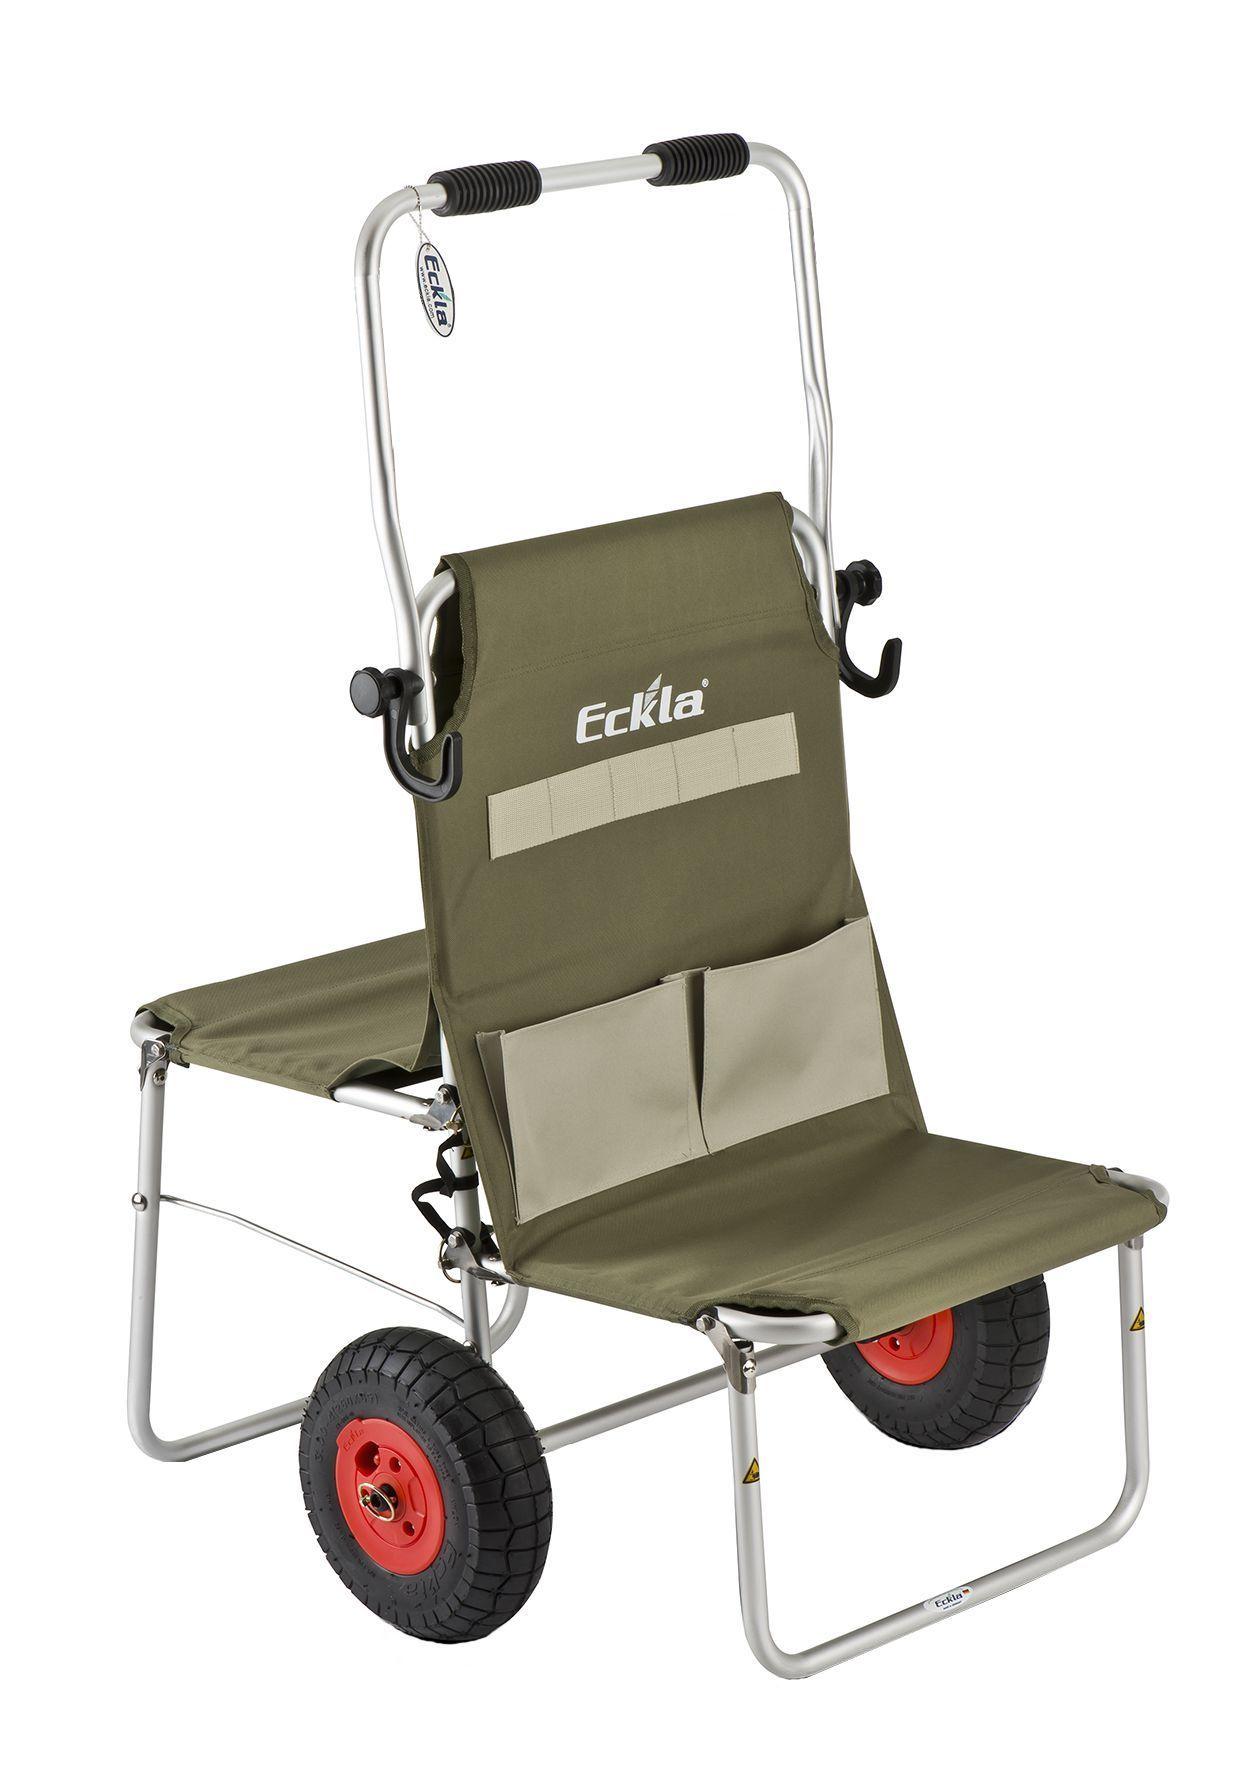 Eckla Multi Rolly Transportwagen klappbar luftbereift Bild 1